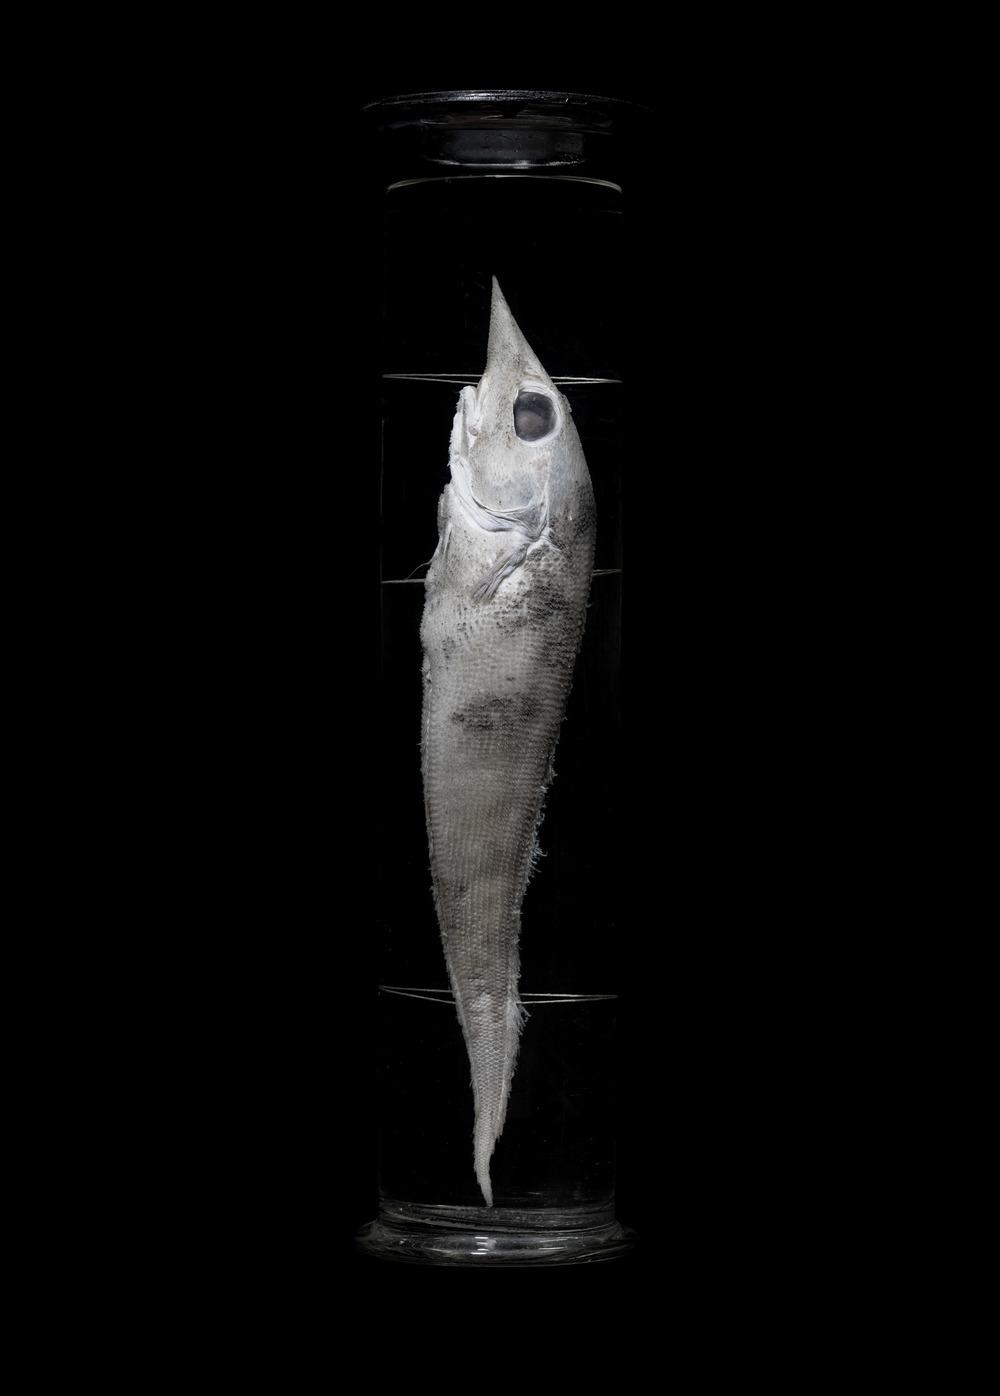 Coelorhynchus Risso